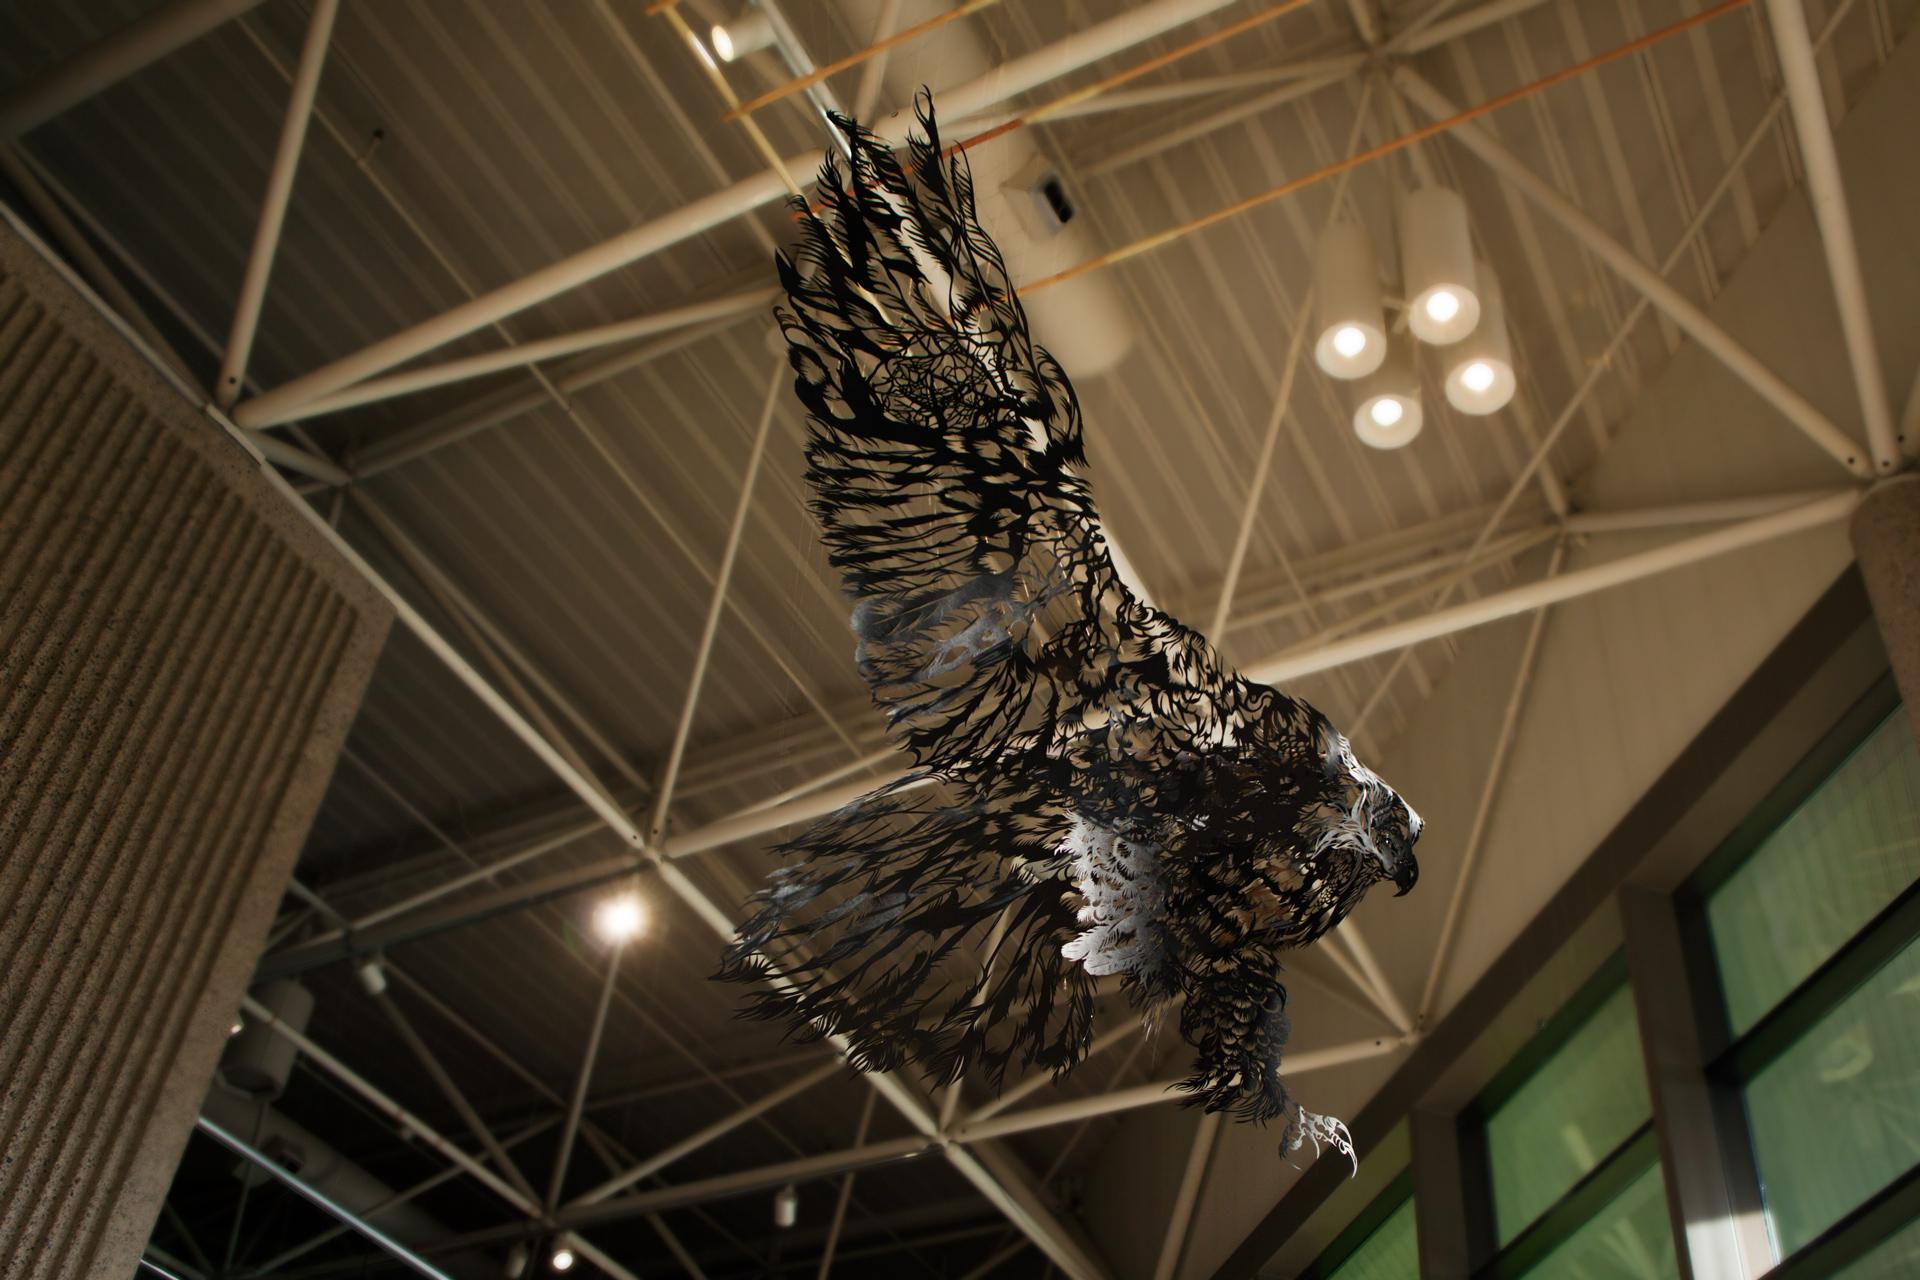 ArtPrize2014 Paper Cut Sculpture Washi Bald Eagle Nahoko Kojima ArtPrize